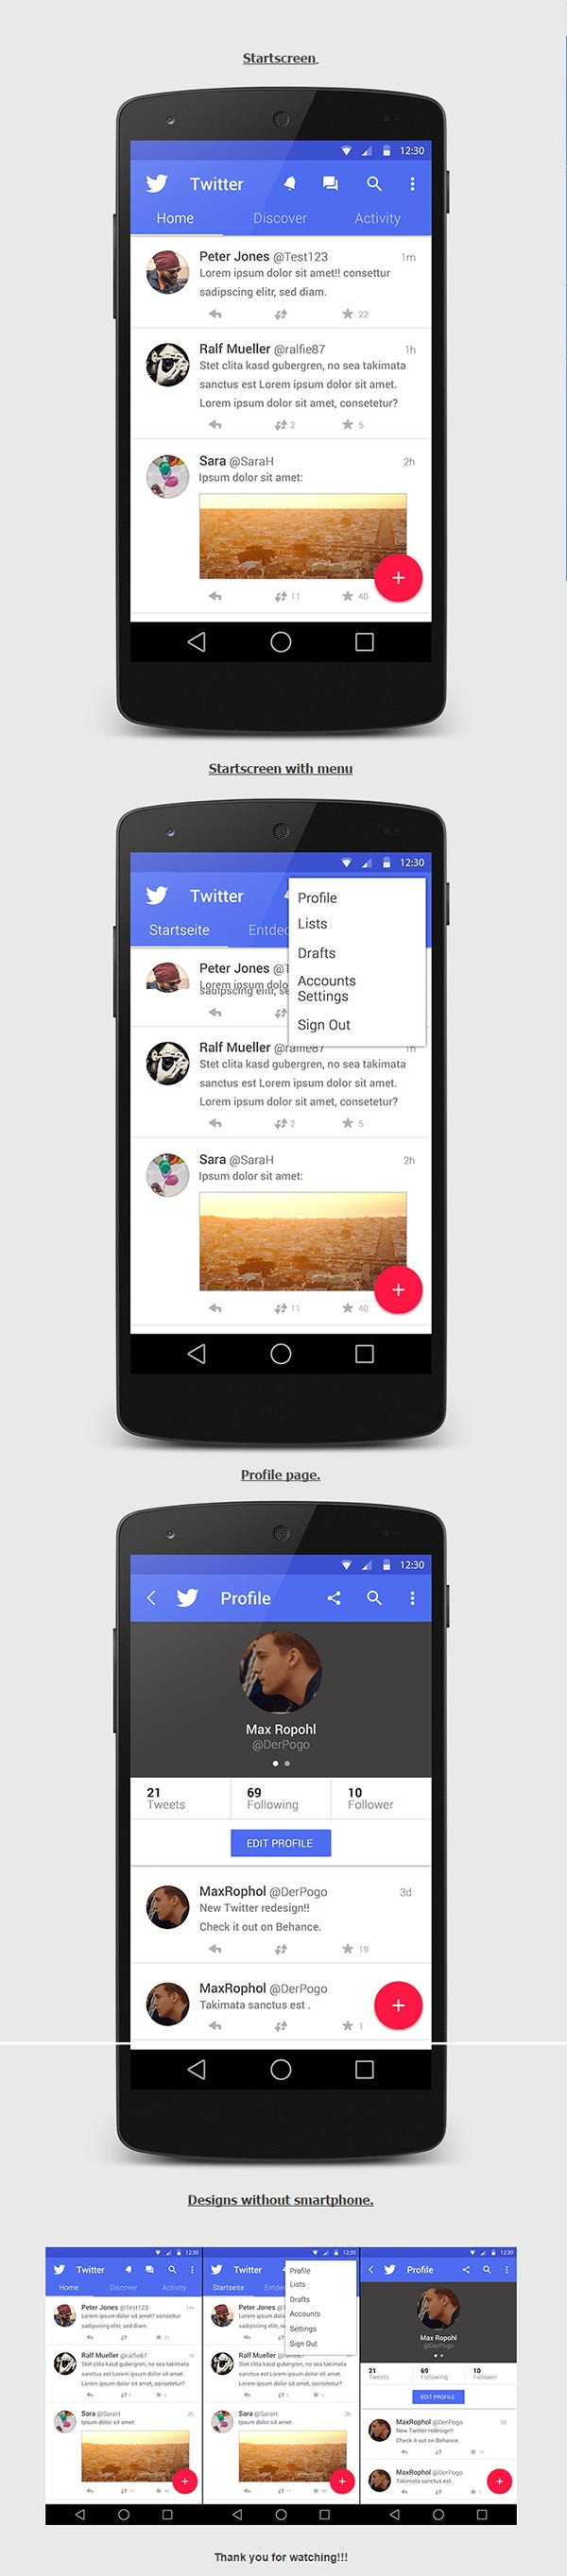 twitter app design concept